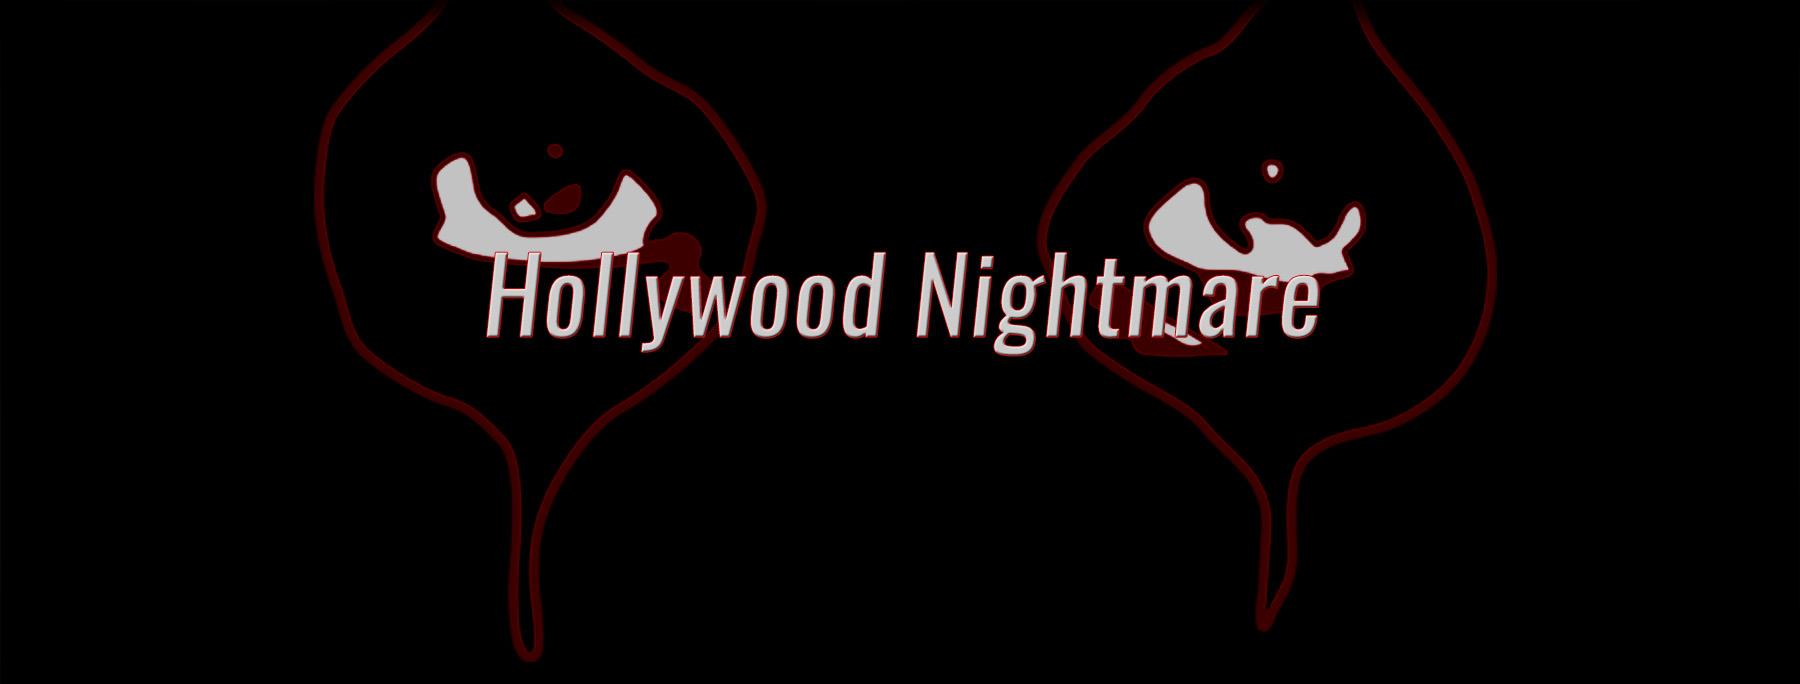 alice-cooper-hollywood-nightmare-rolex-banner.jpg